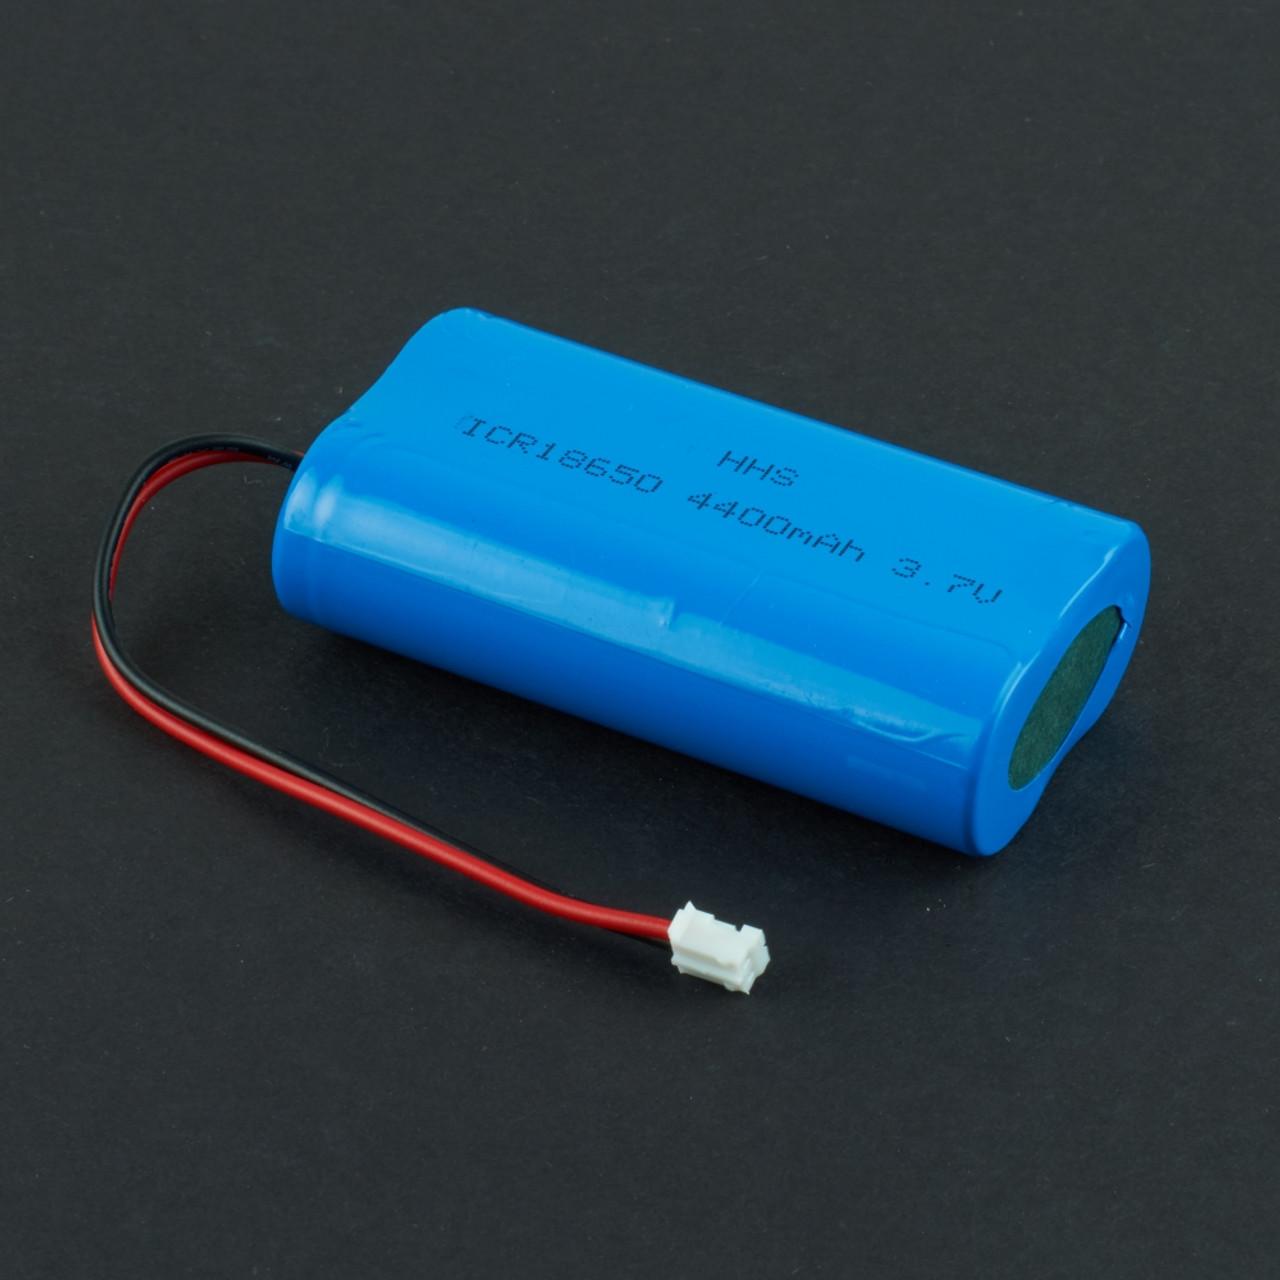 Lithium Ion battery - 3 7V 4400 mAh